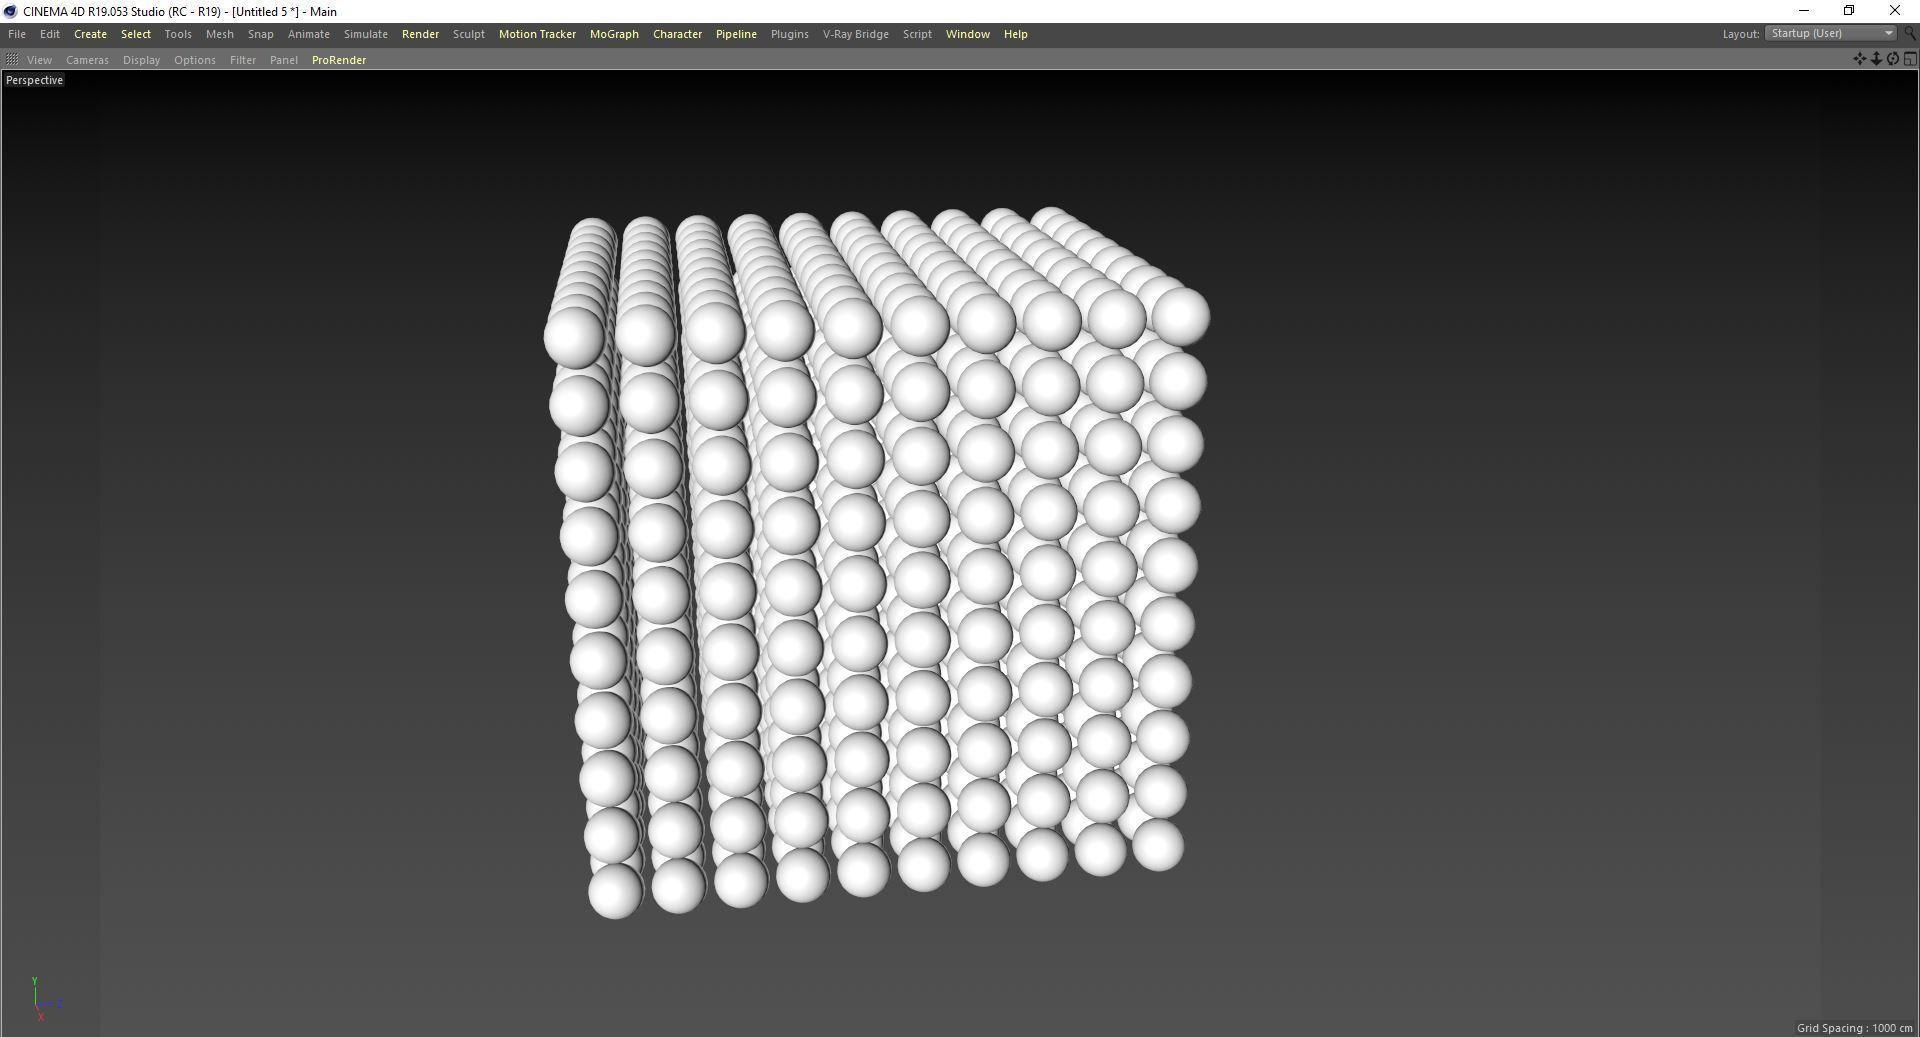 Random color flicker cinema 4d effect 3D model | CGTrader